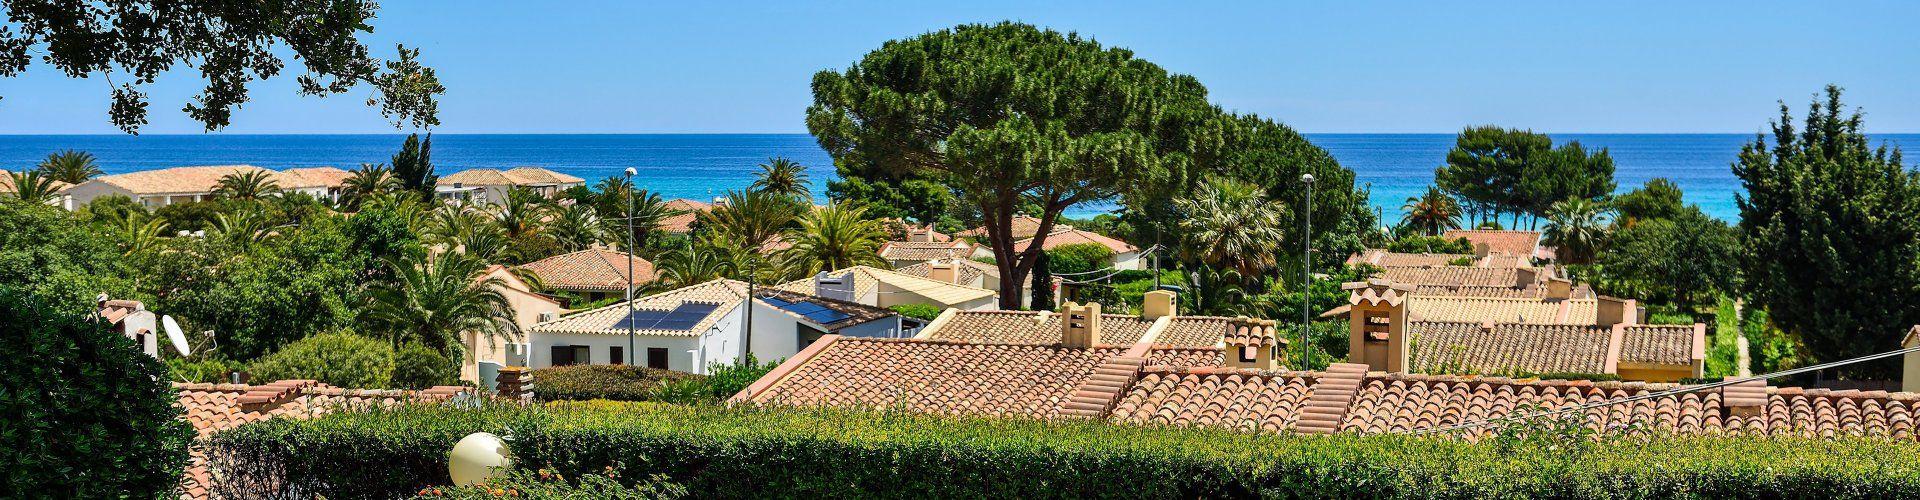 Meerblick vom Garten an der Costa Rei